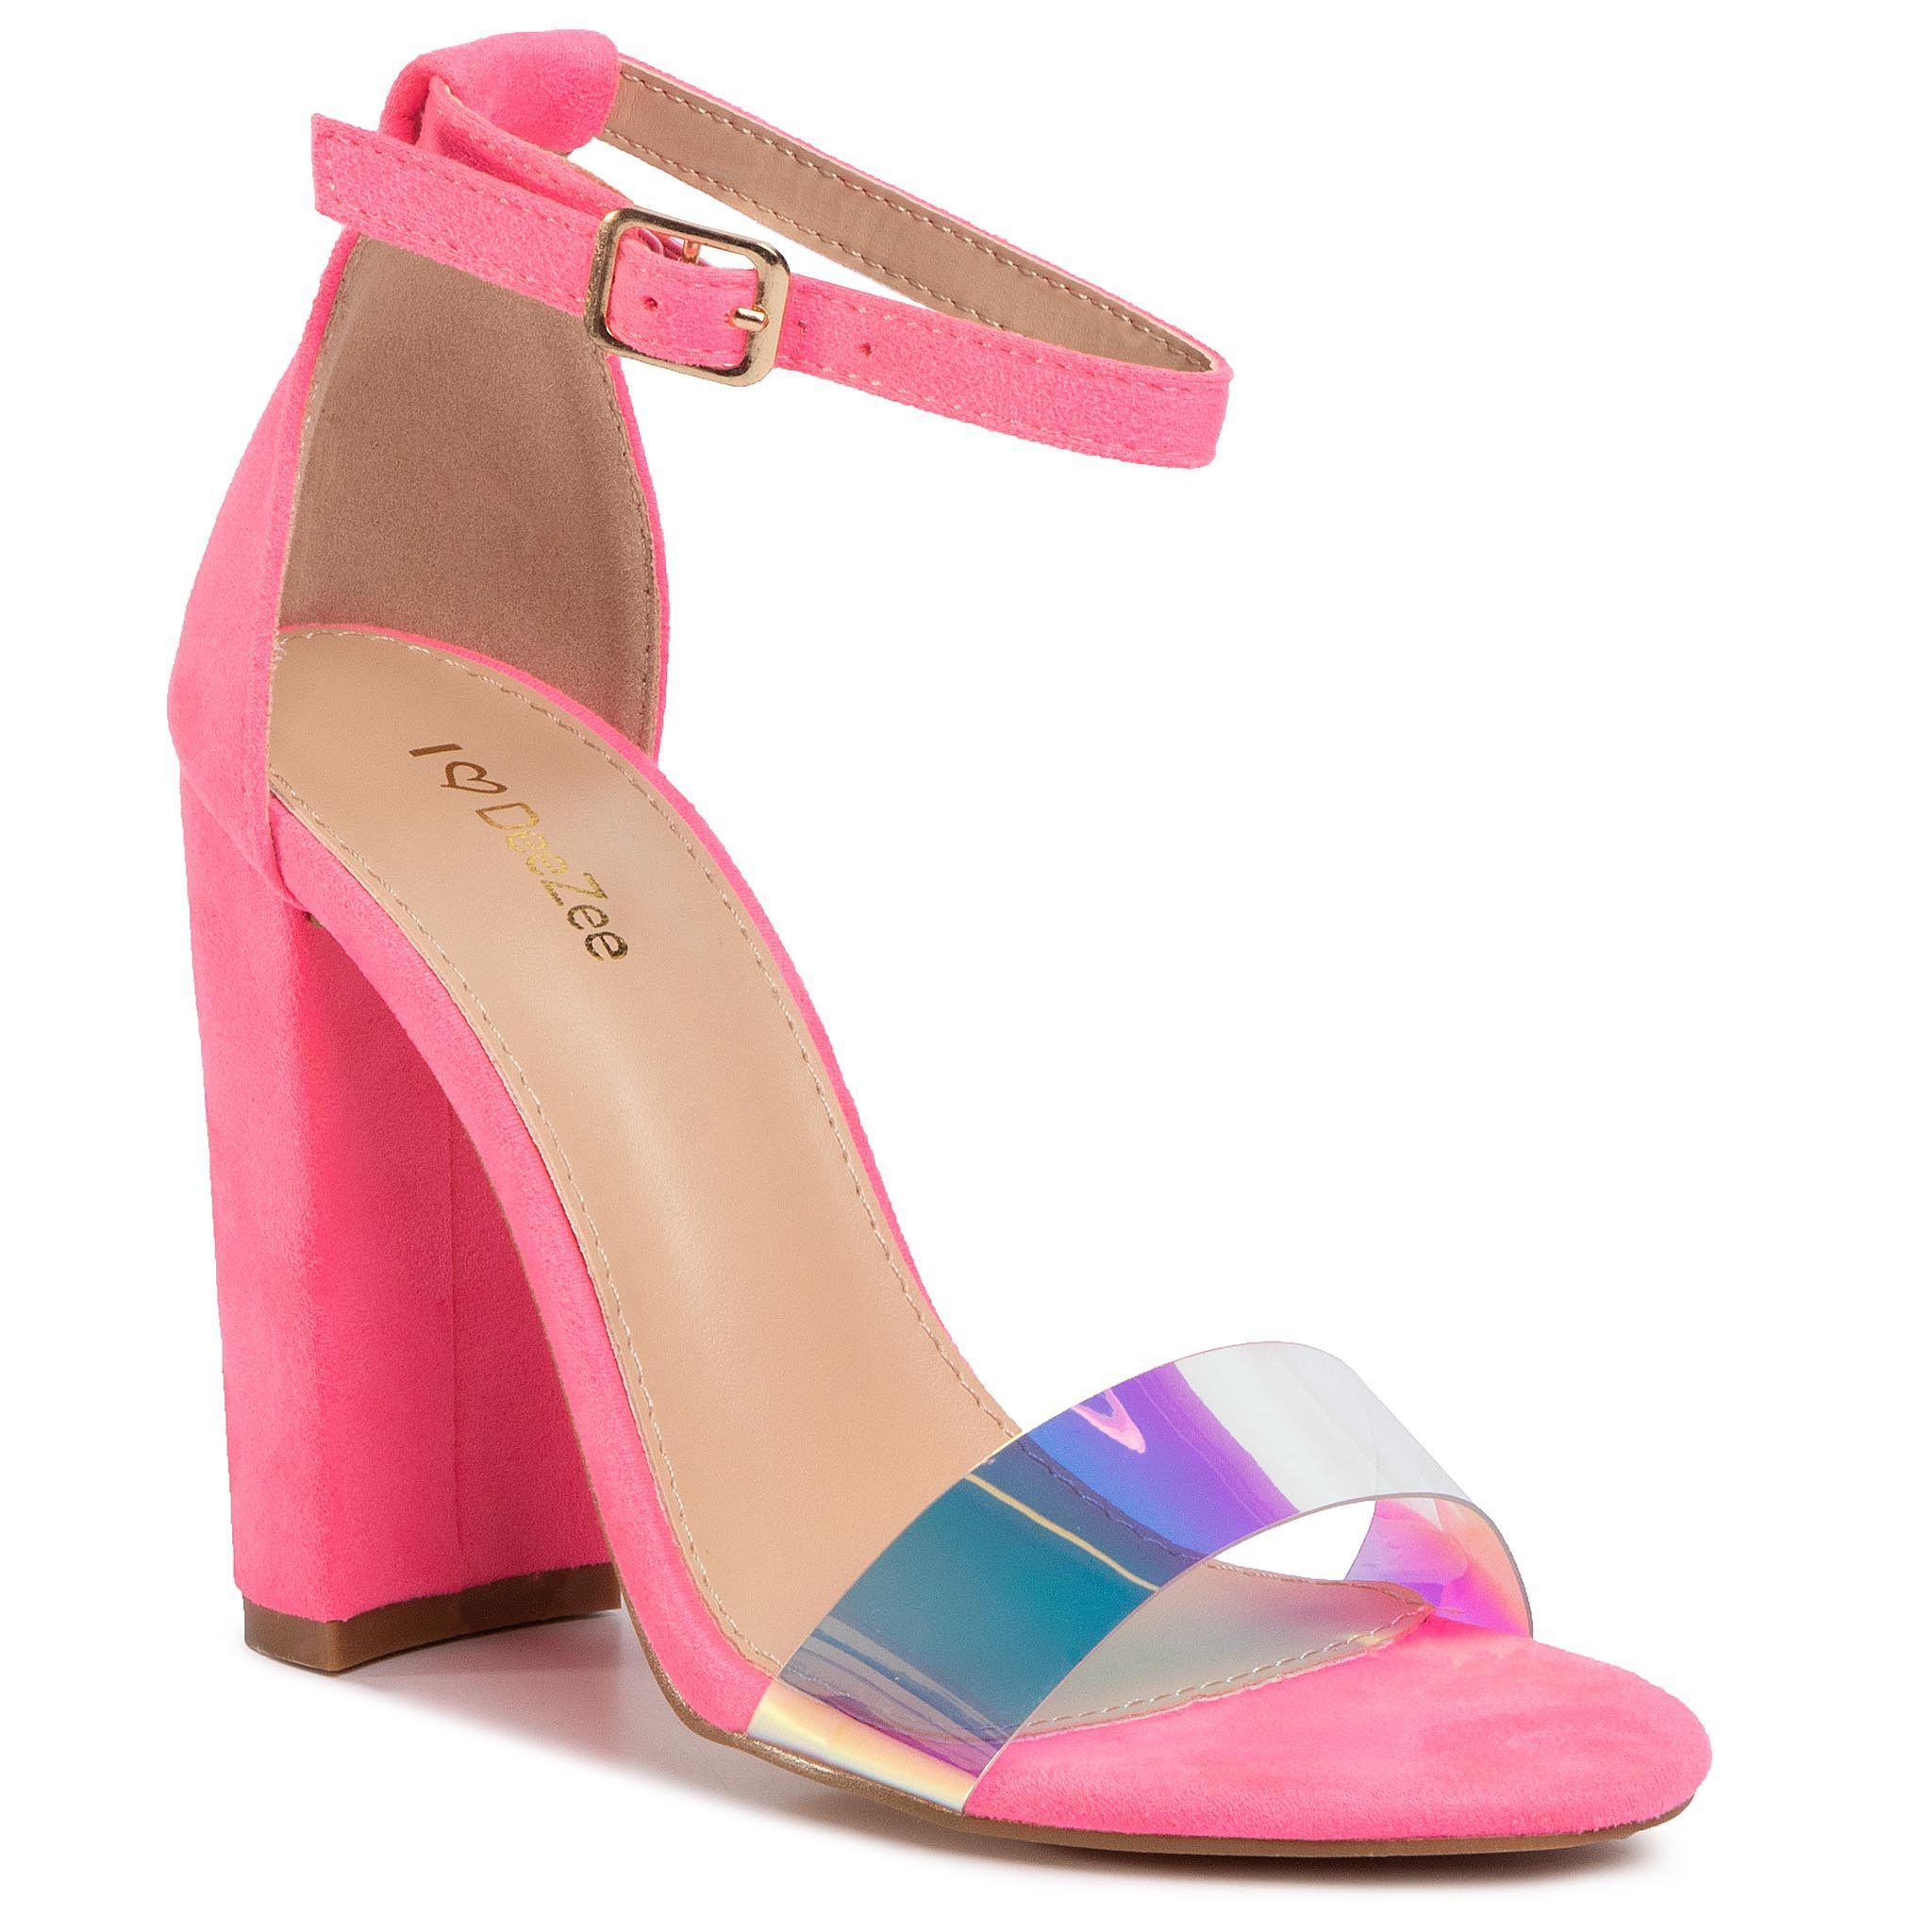 Pin By Monika P On Monika In 2020 Heels Shoes Fashion